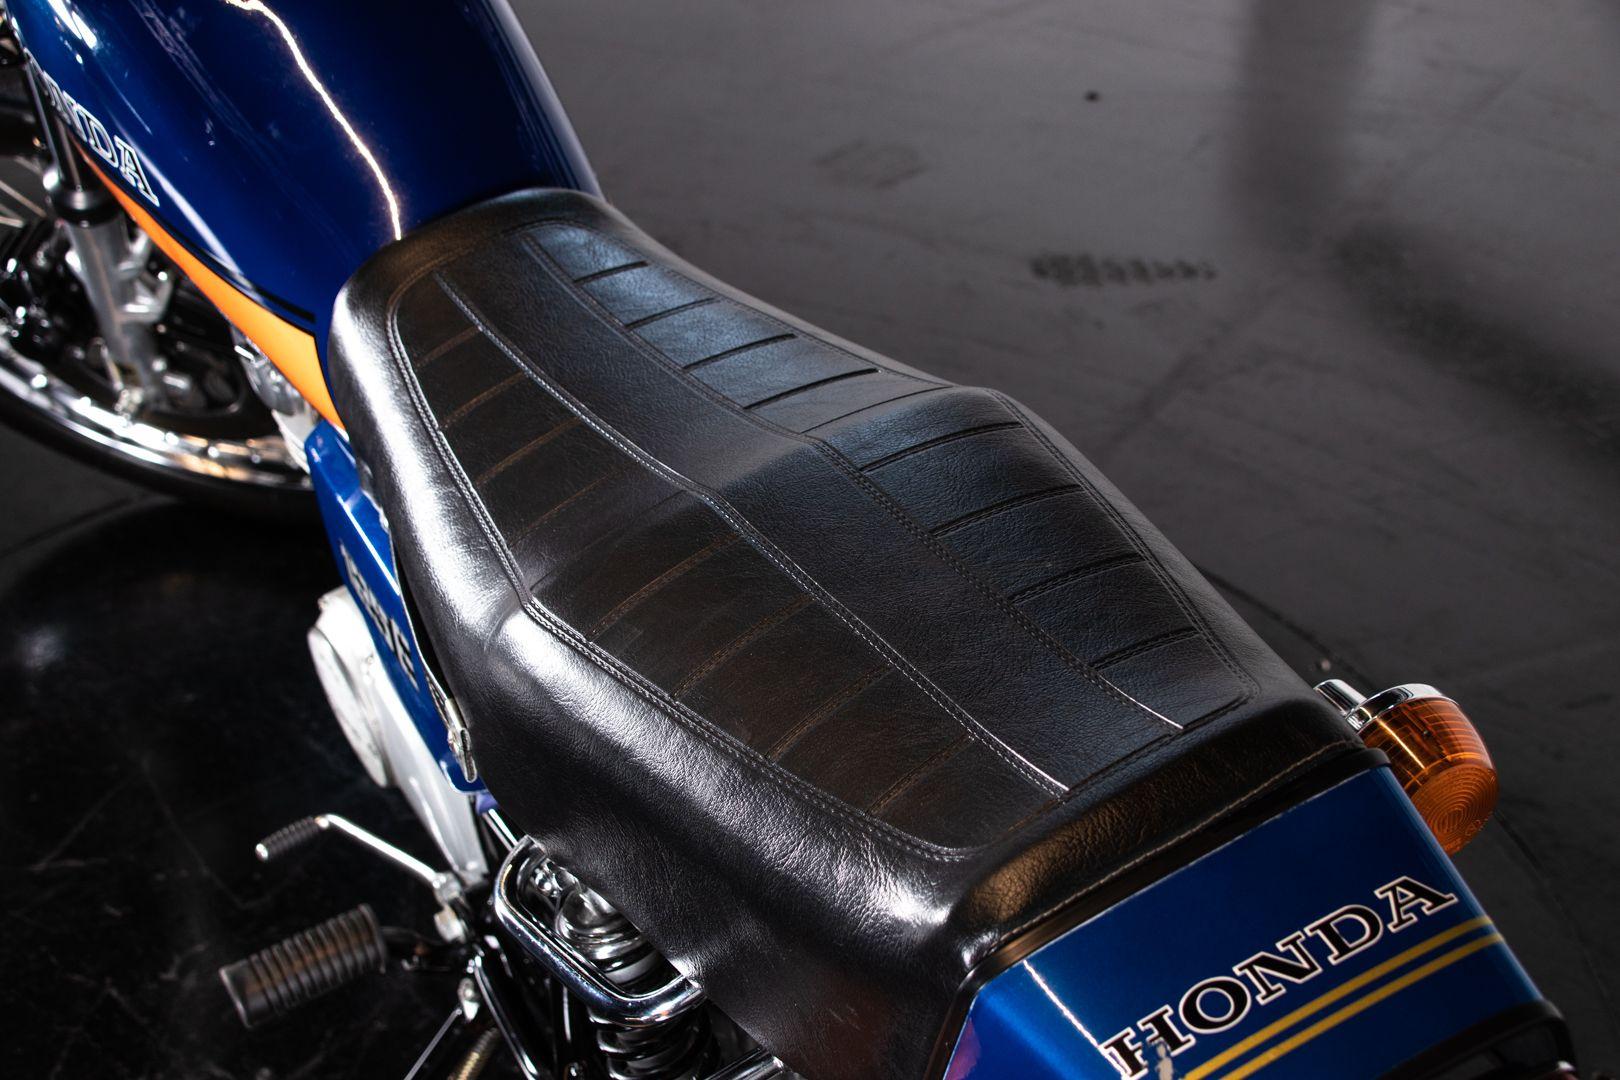 1980 Honda CB 125 7/C 63462